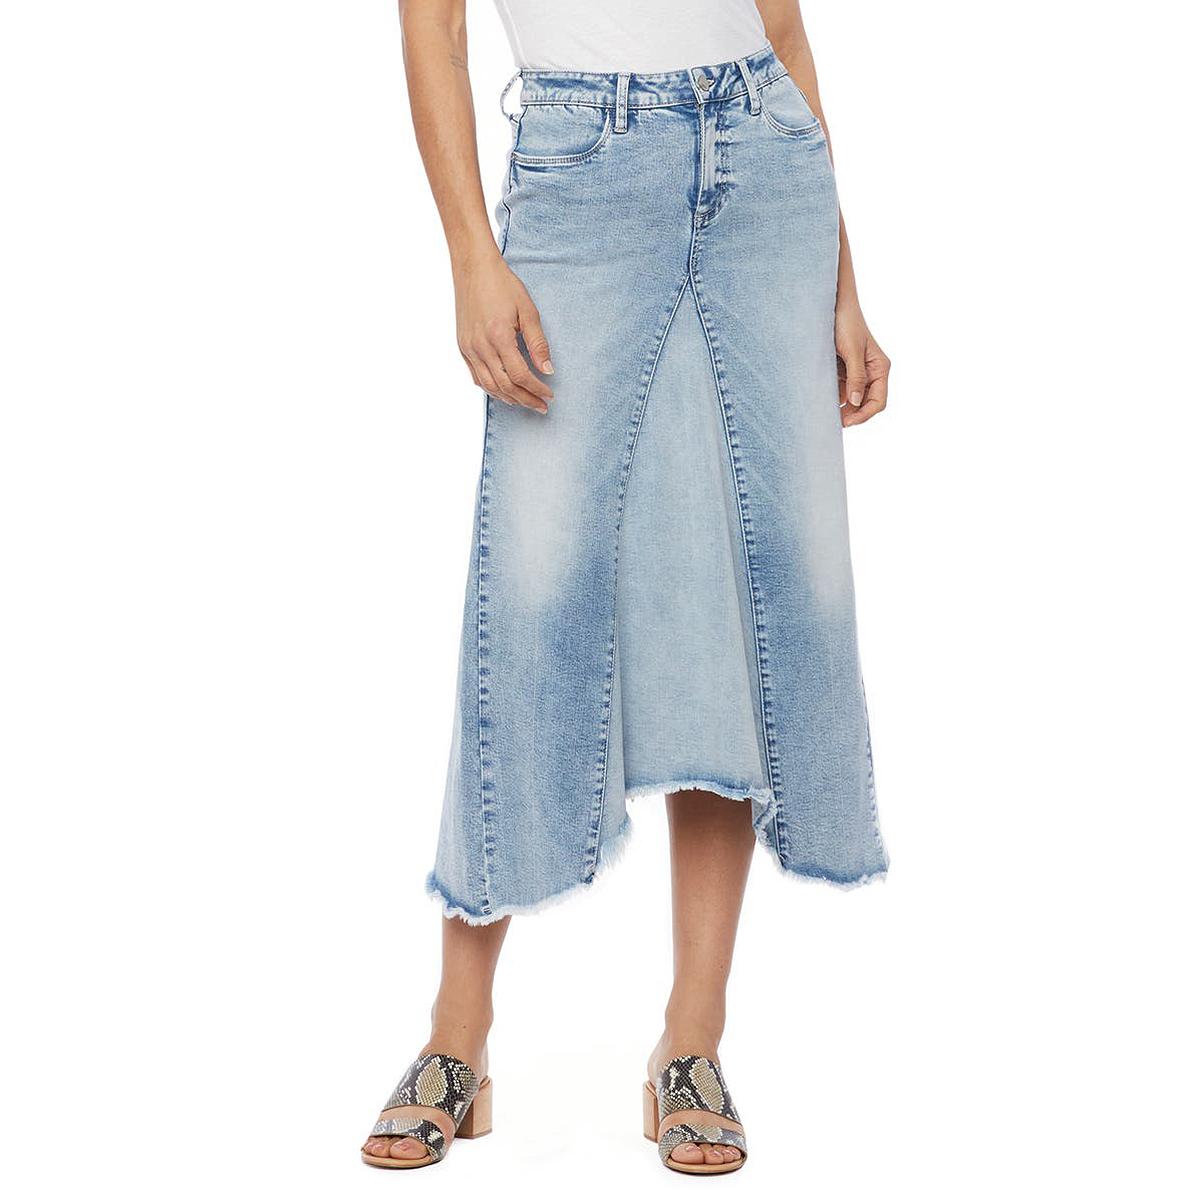 nordstrom-sale-denim-midi-skirt